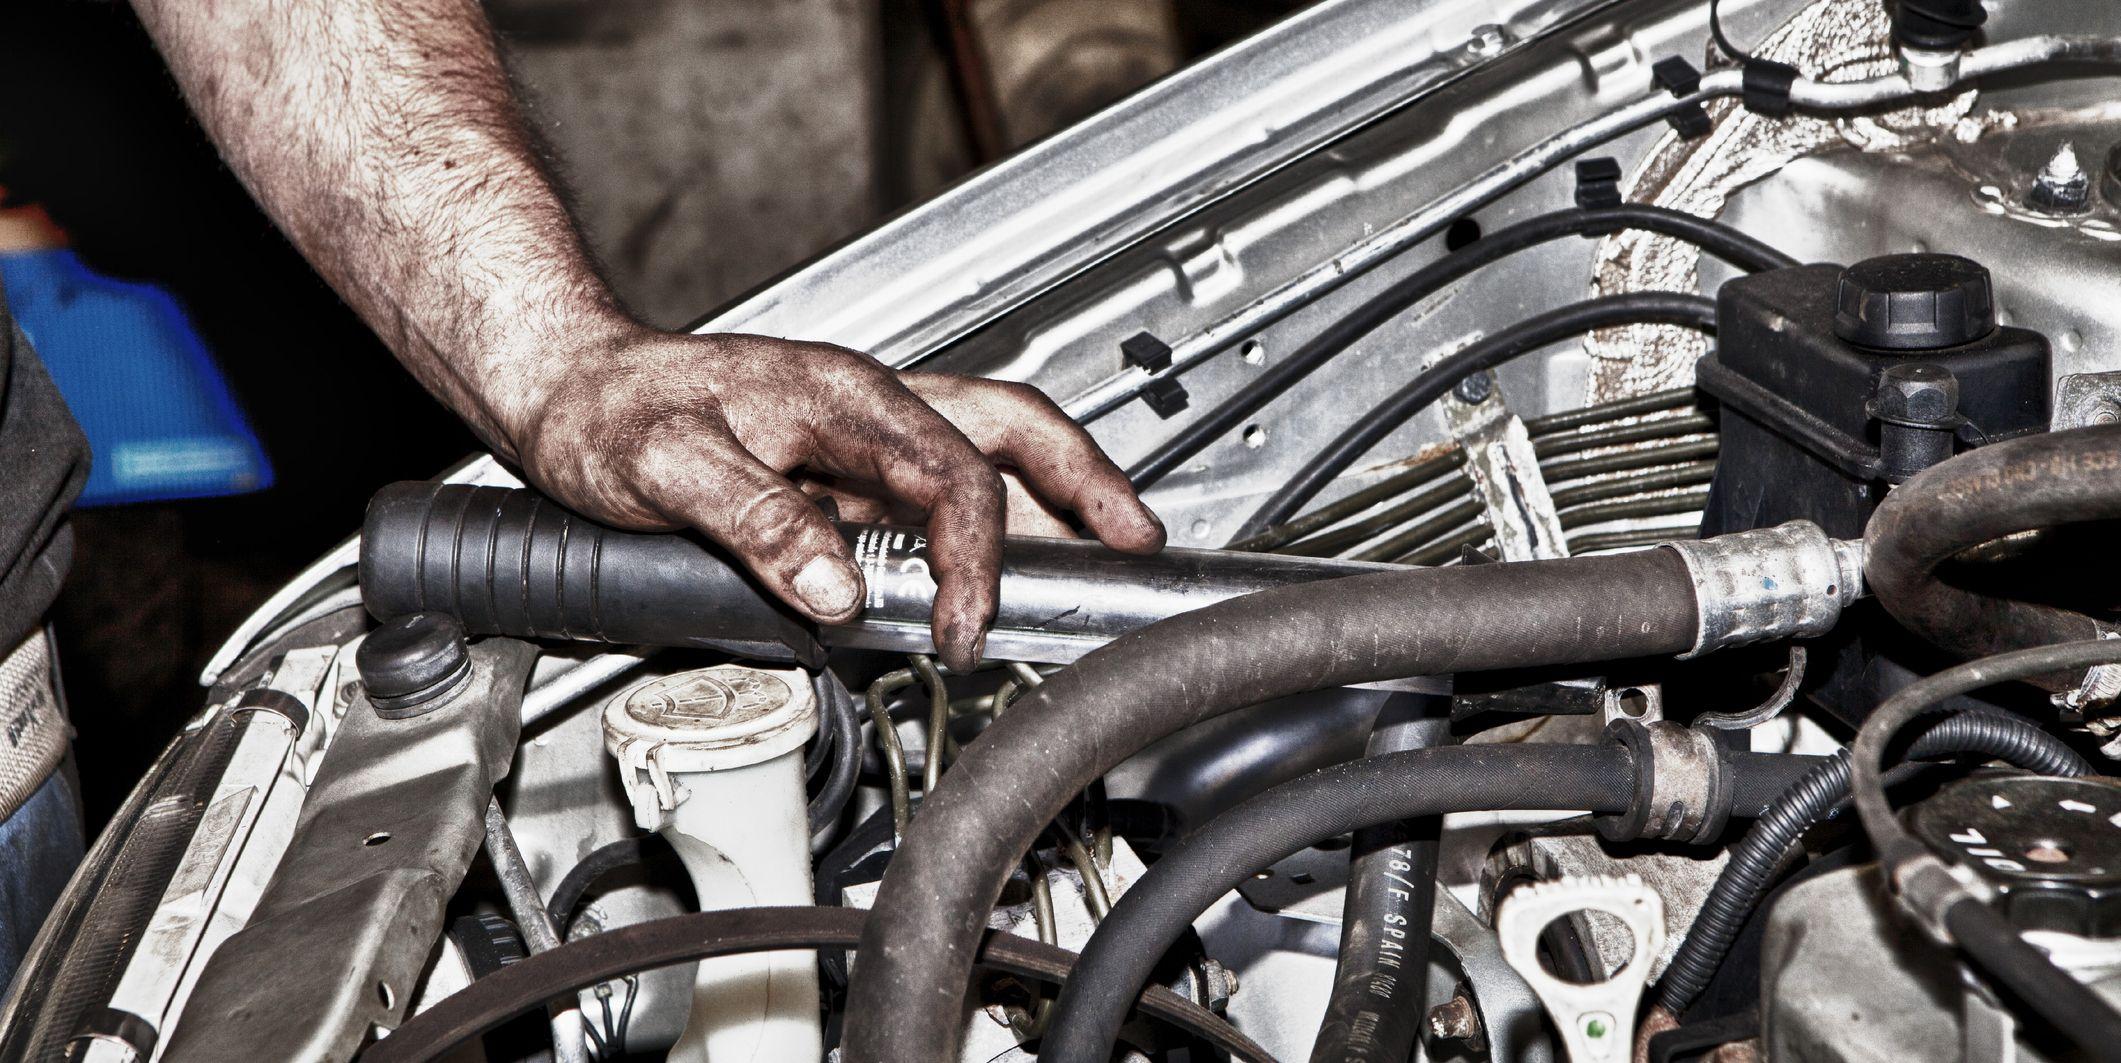 Car mechanic under the hood